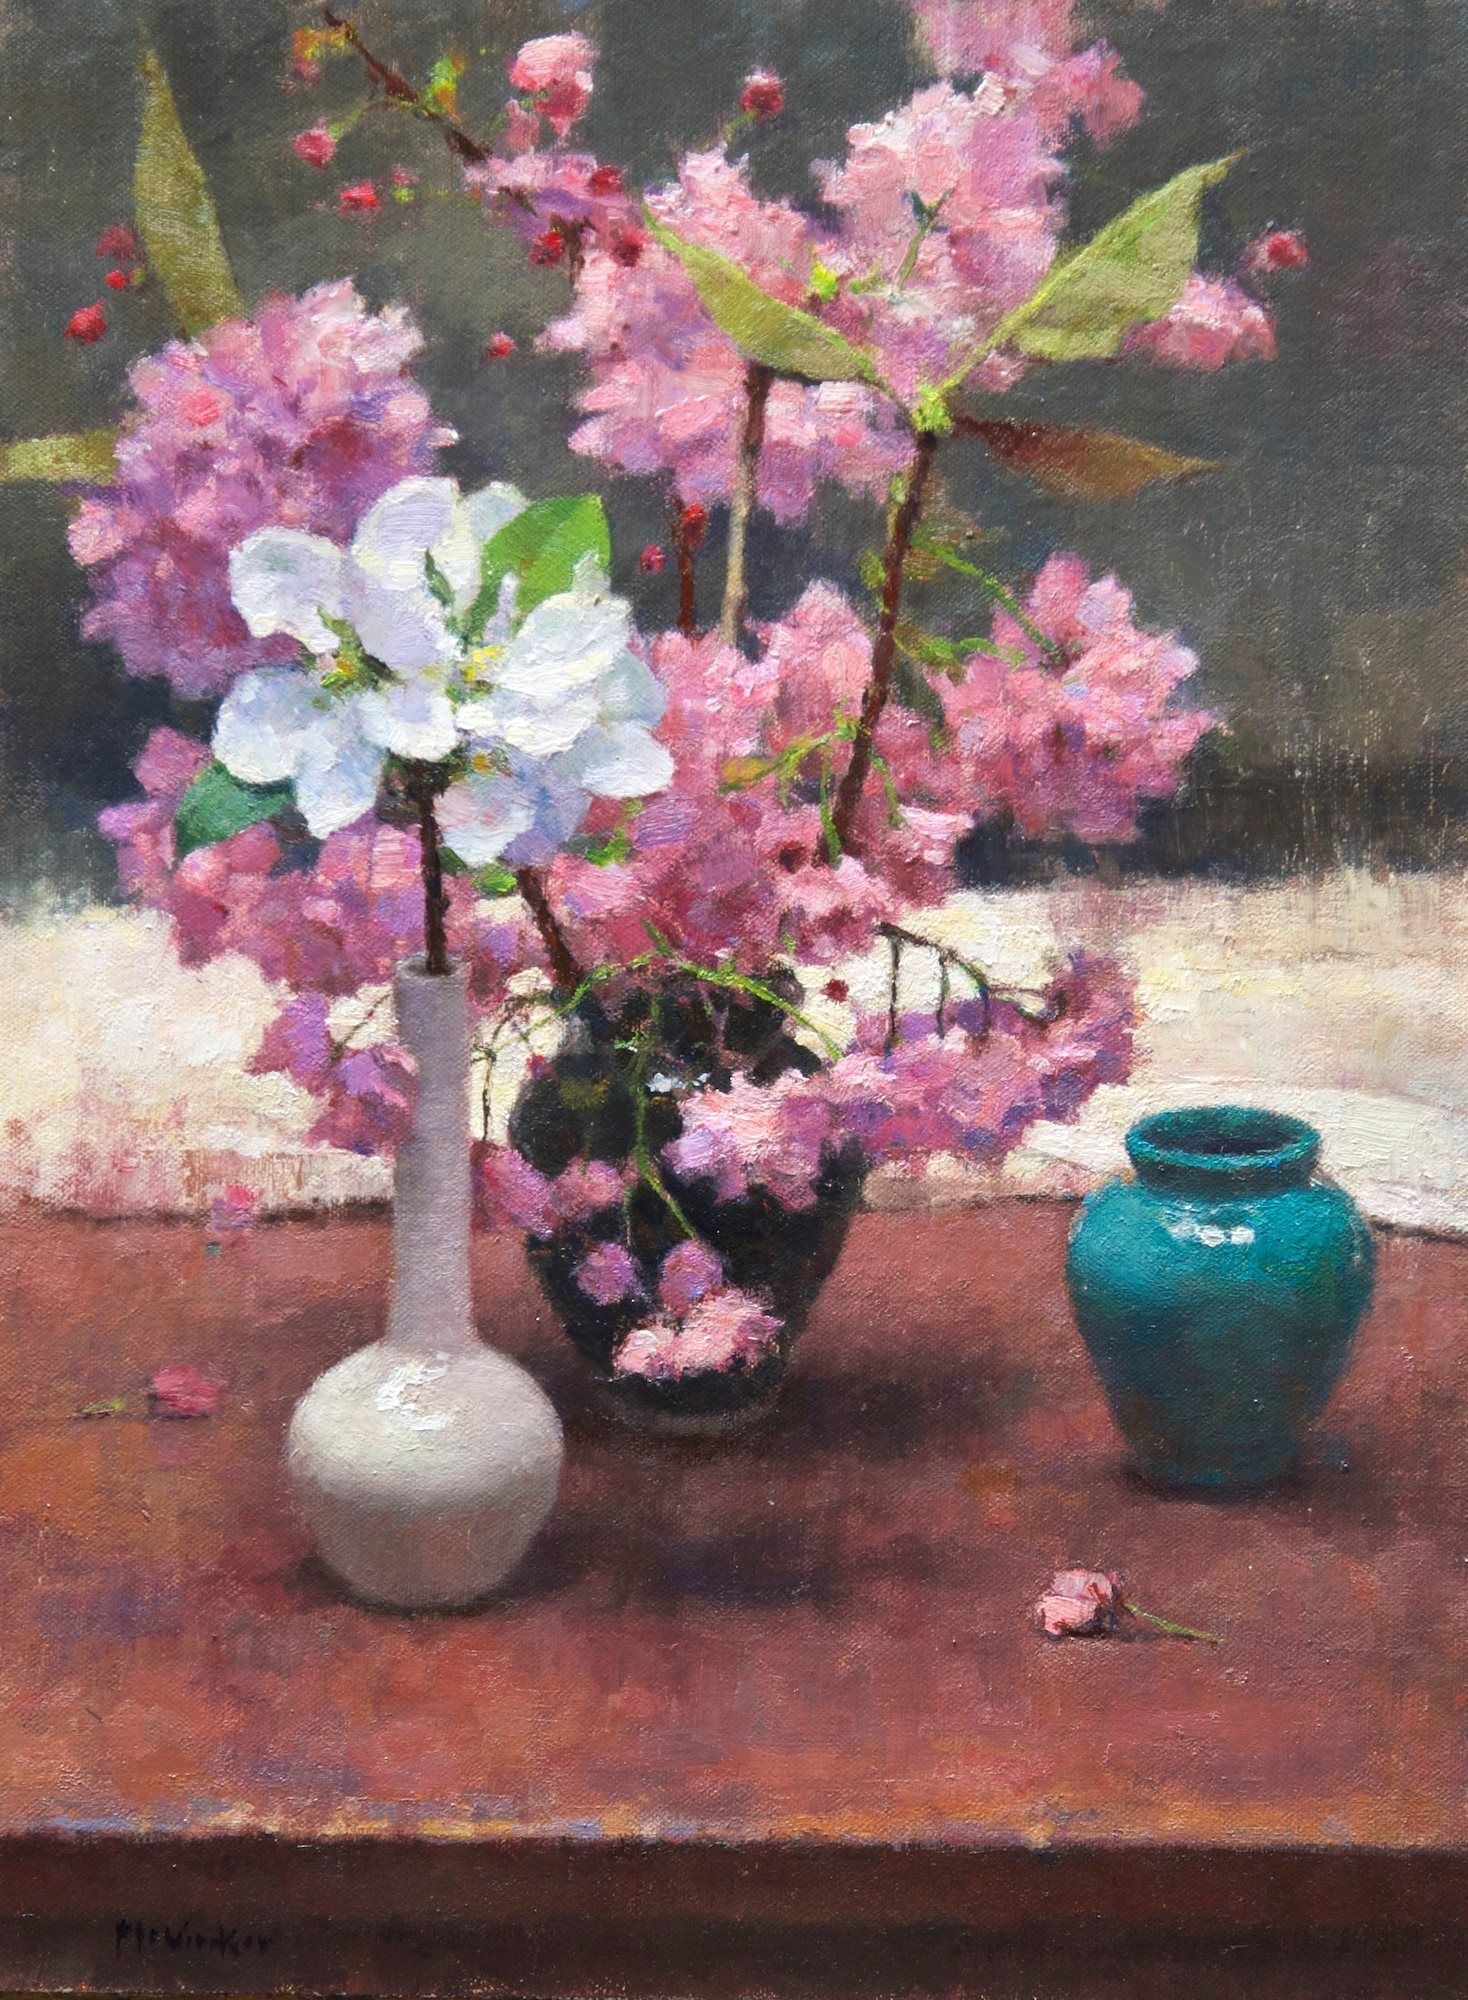 Jim McVicker 'Apple and Cherry Blossoms' 16x12 | Jim ...